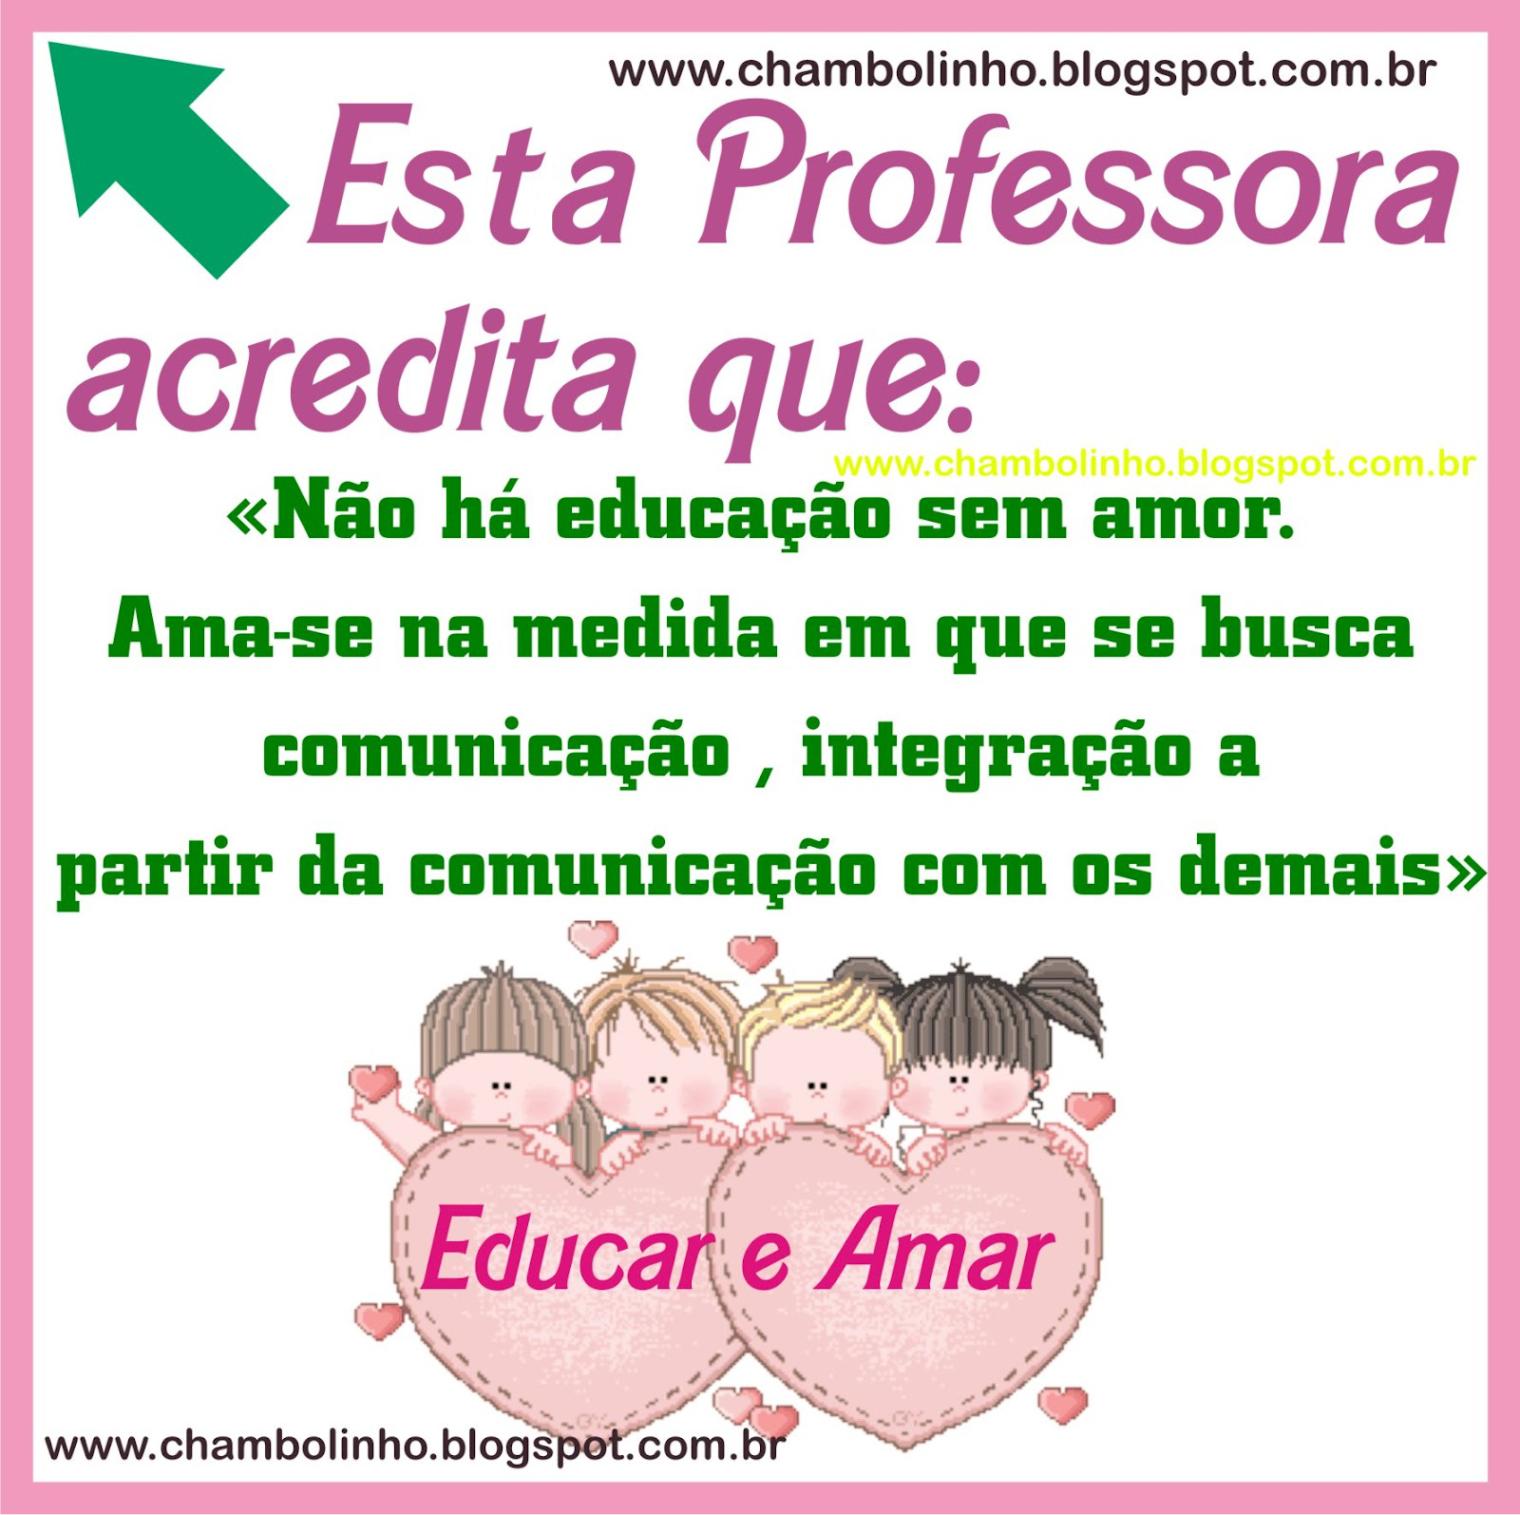 Esta Professora Frases de Freire para Facebook